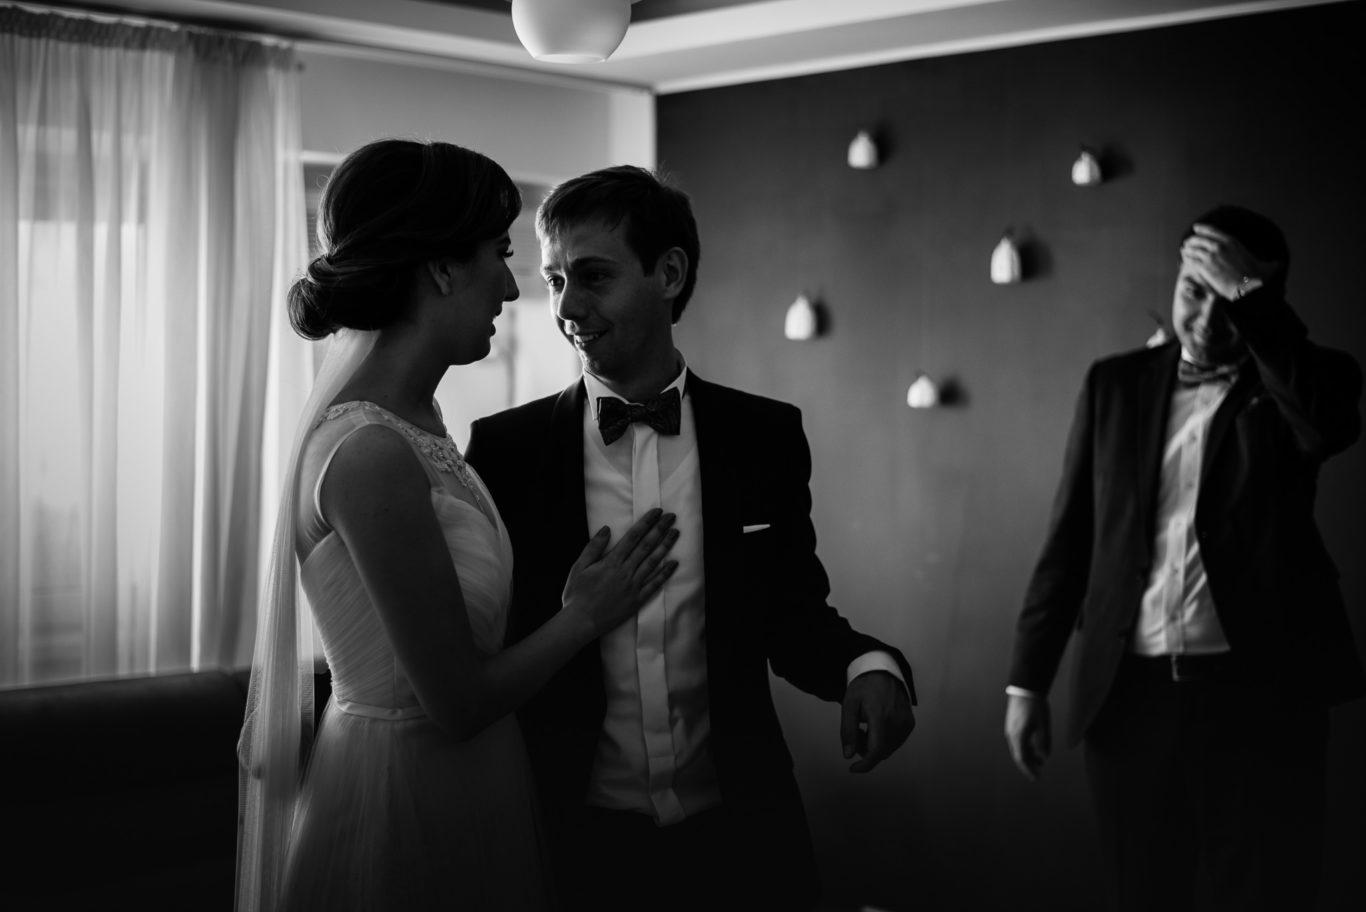 0166-Fotografie-nunta-Bucuresti-Oana-Catalin-fotograf-Ciprian-Dumitrescu-DSC_3798